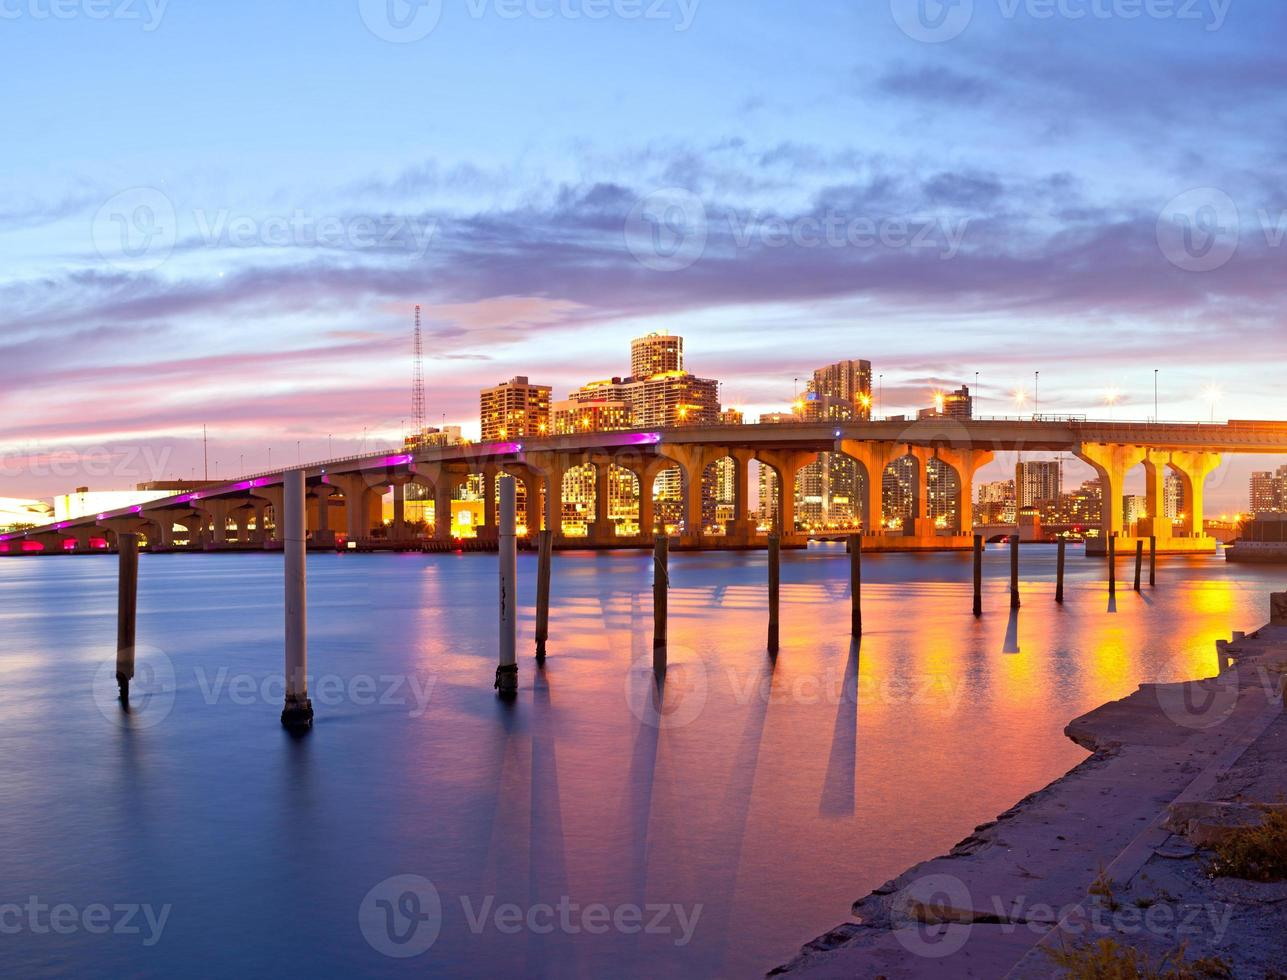 stad van miami florida, zomer zonsondergang panorama foto